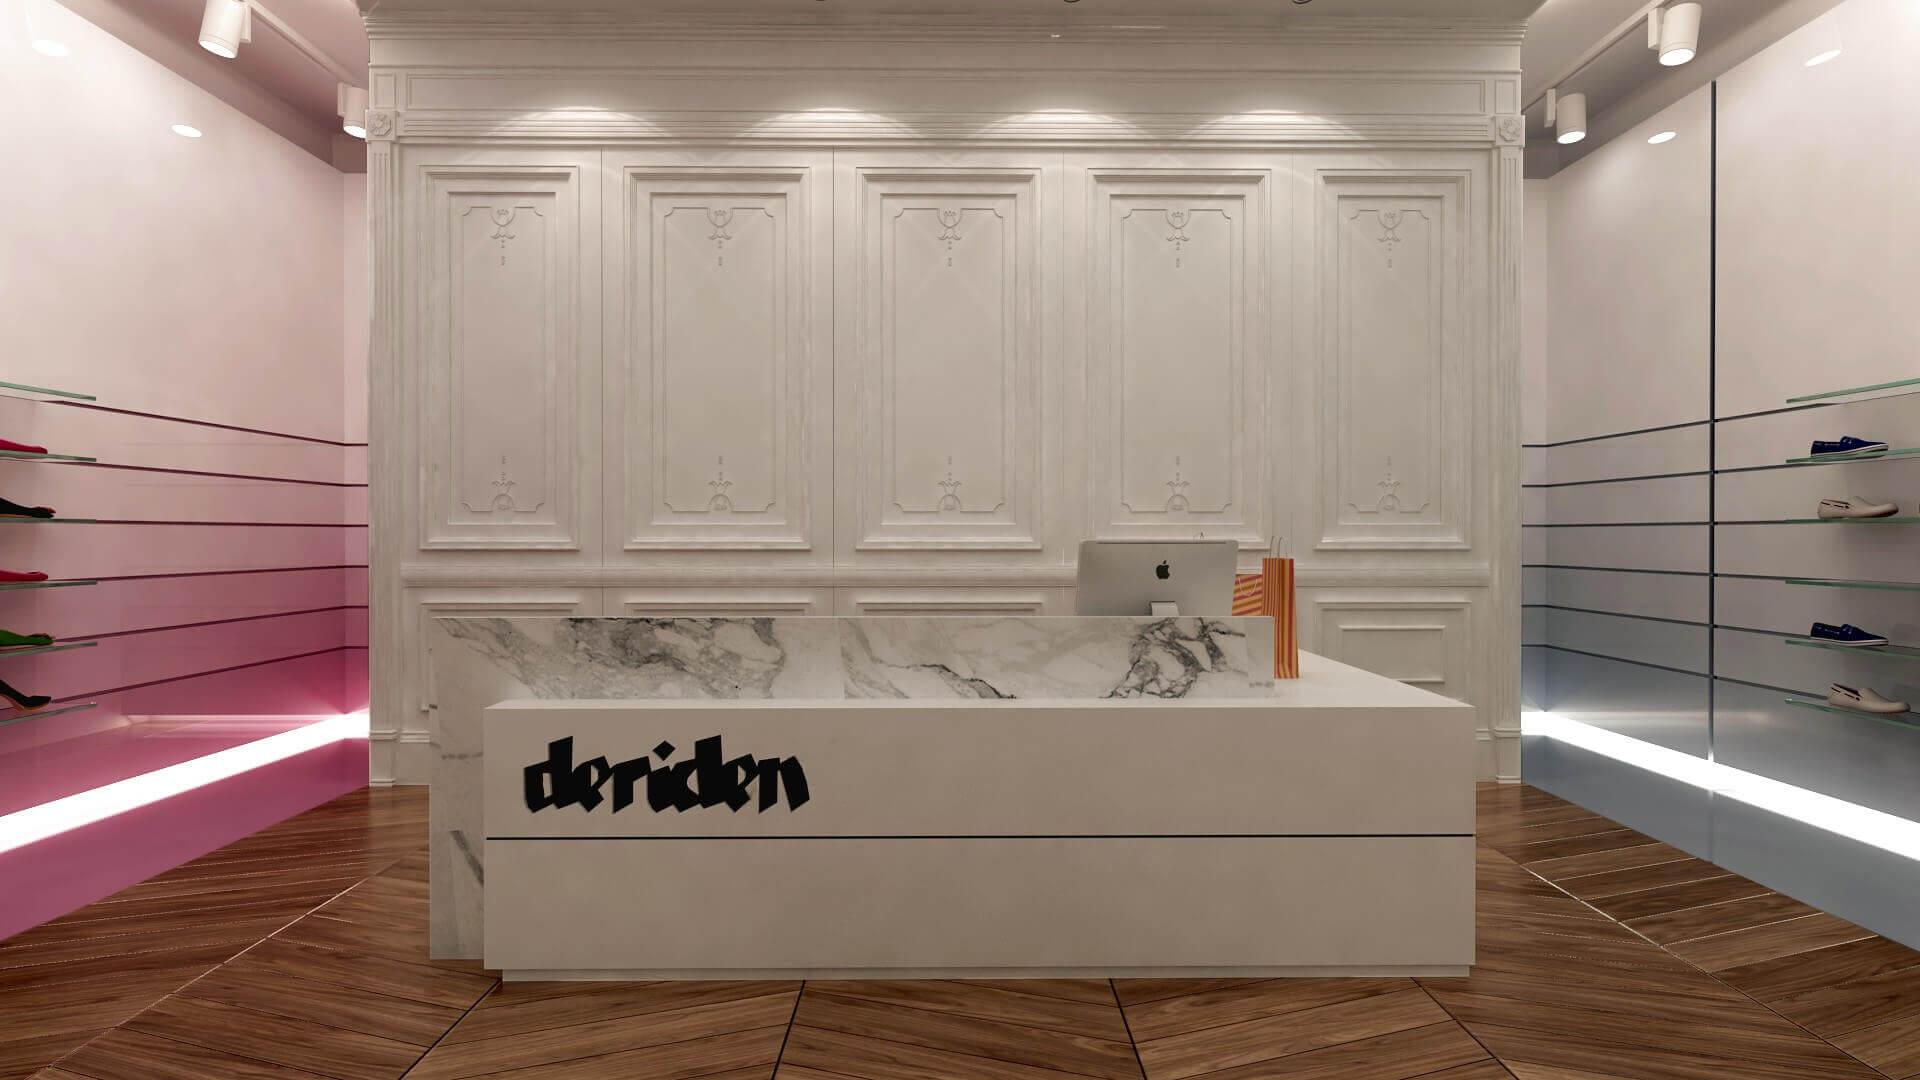 shop design 2016 Deriden Concept Retail